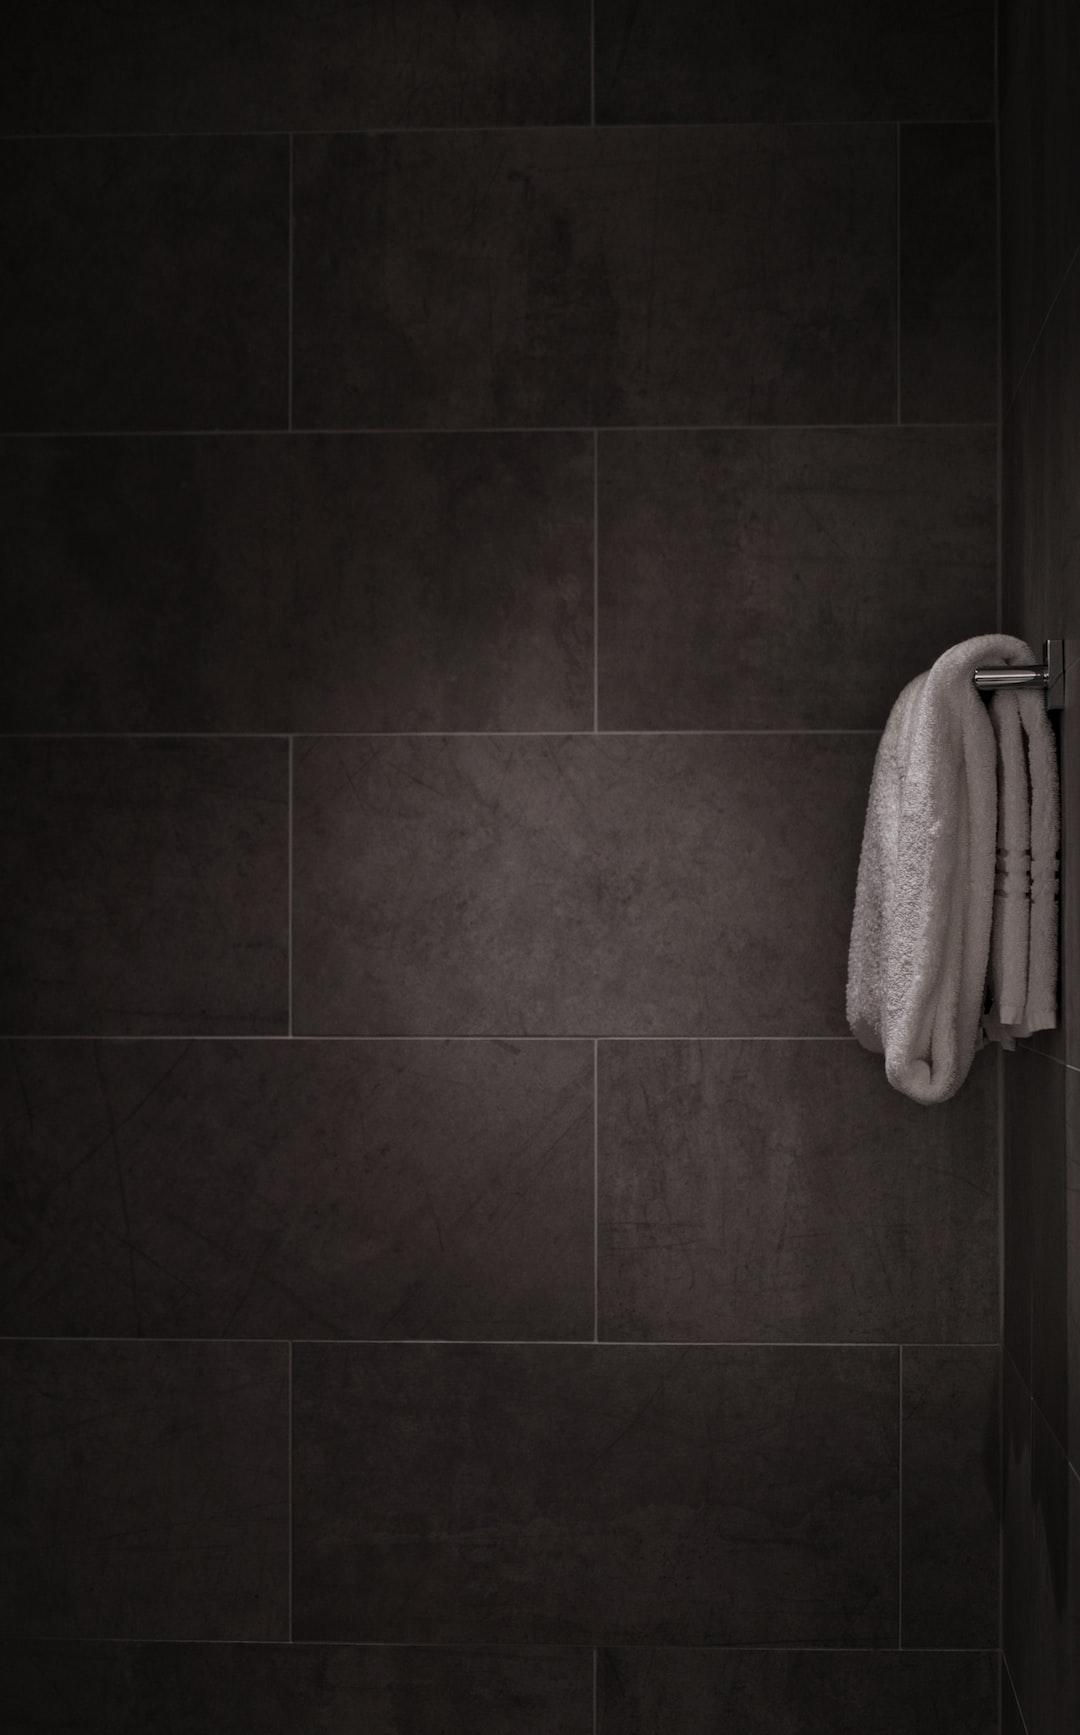 white towel in tiled bathroom